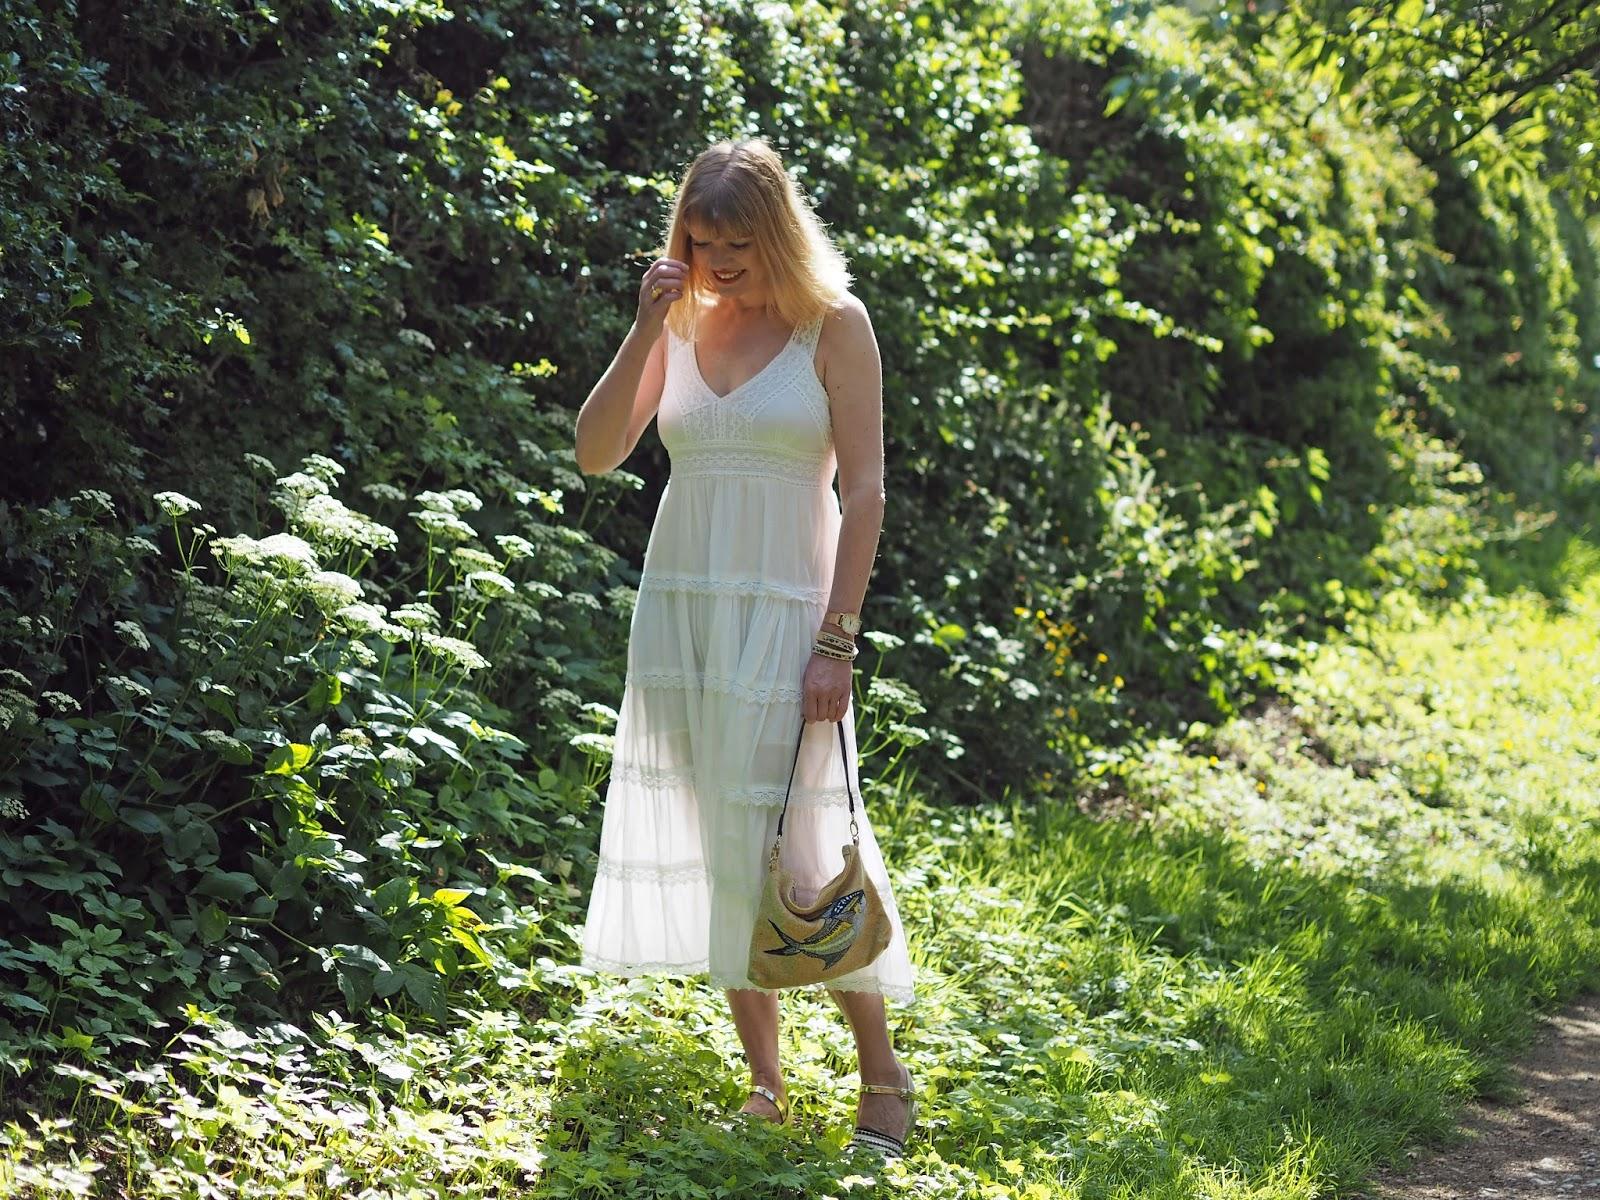 white lace midi dress with espadrilles, sunshine